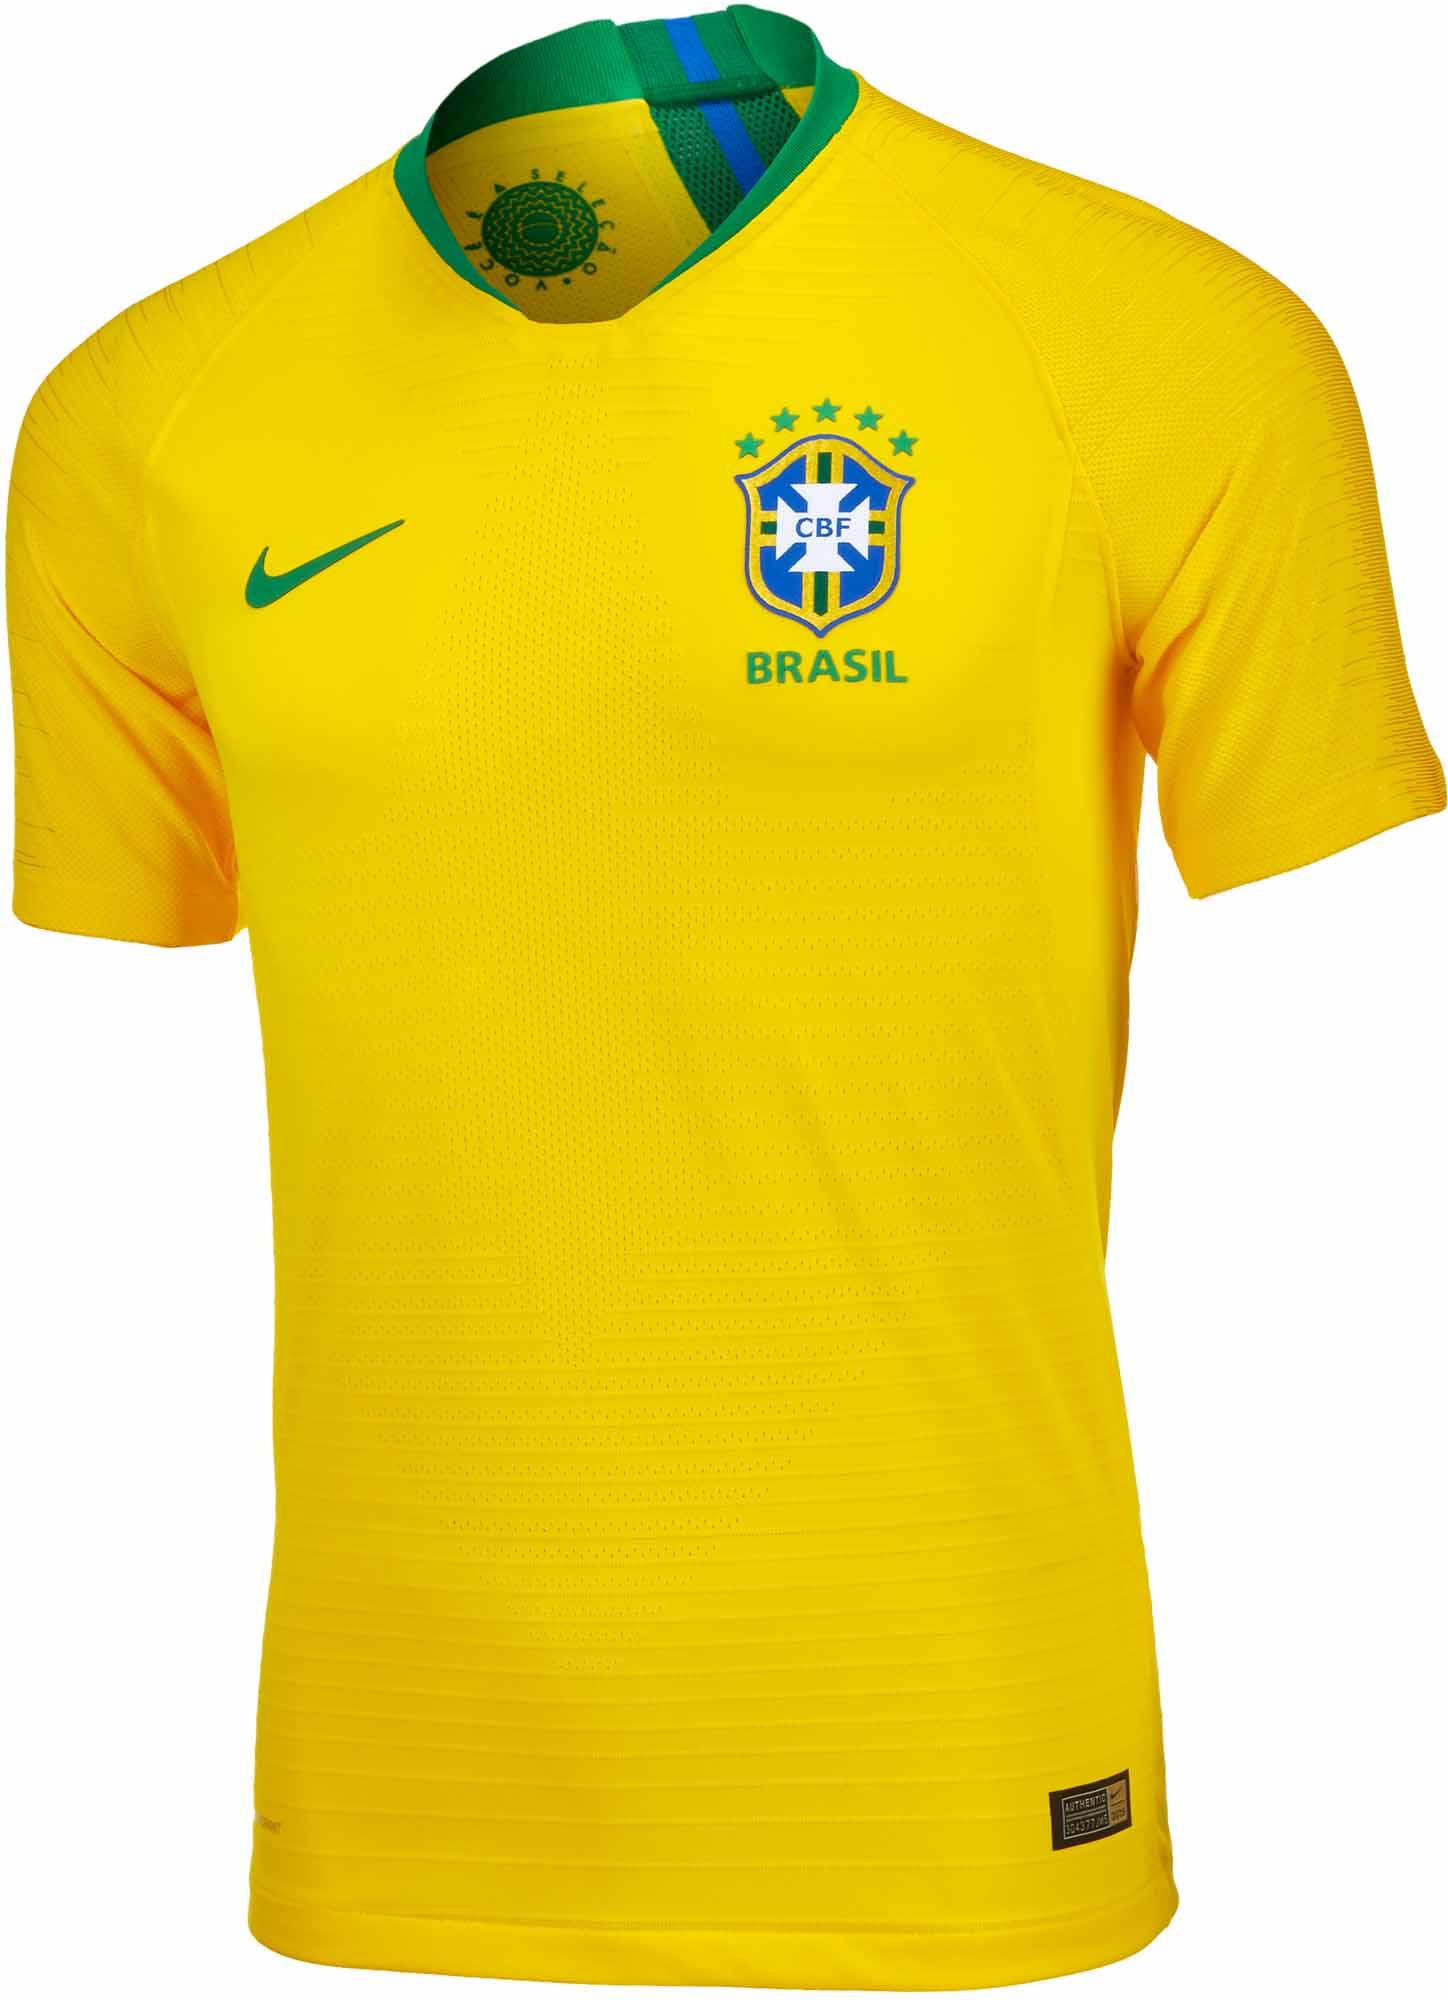 Nike Brazil Home Match Jersey 2018-19 - SoccerPro.com